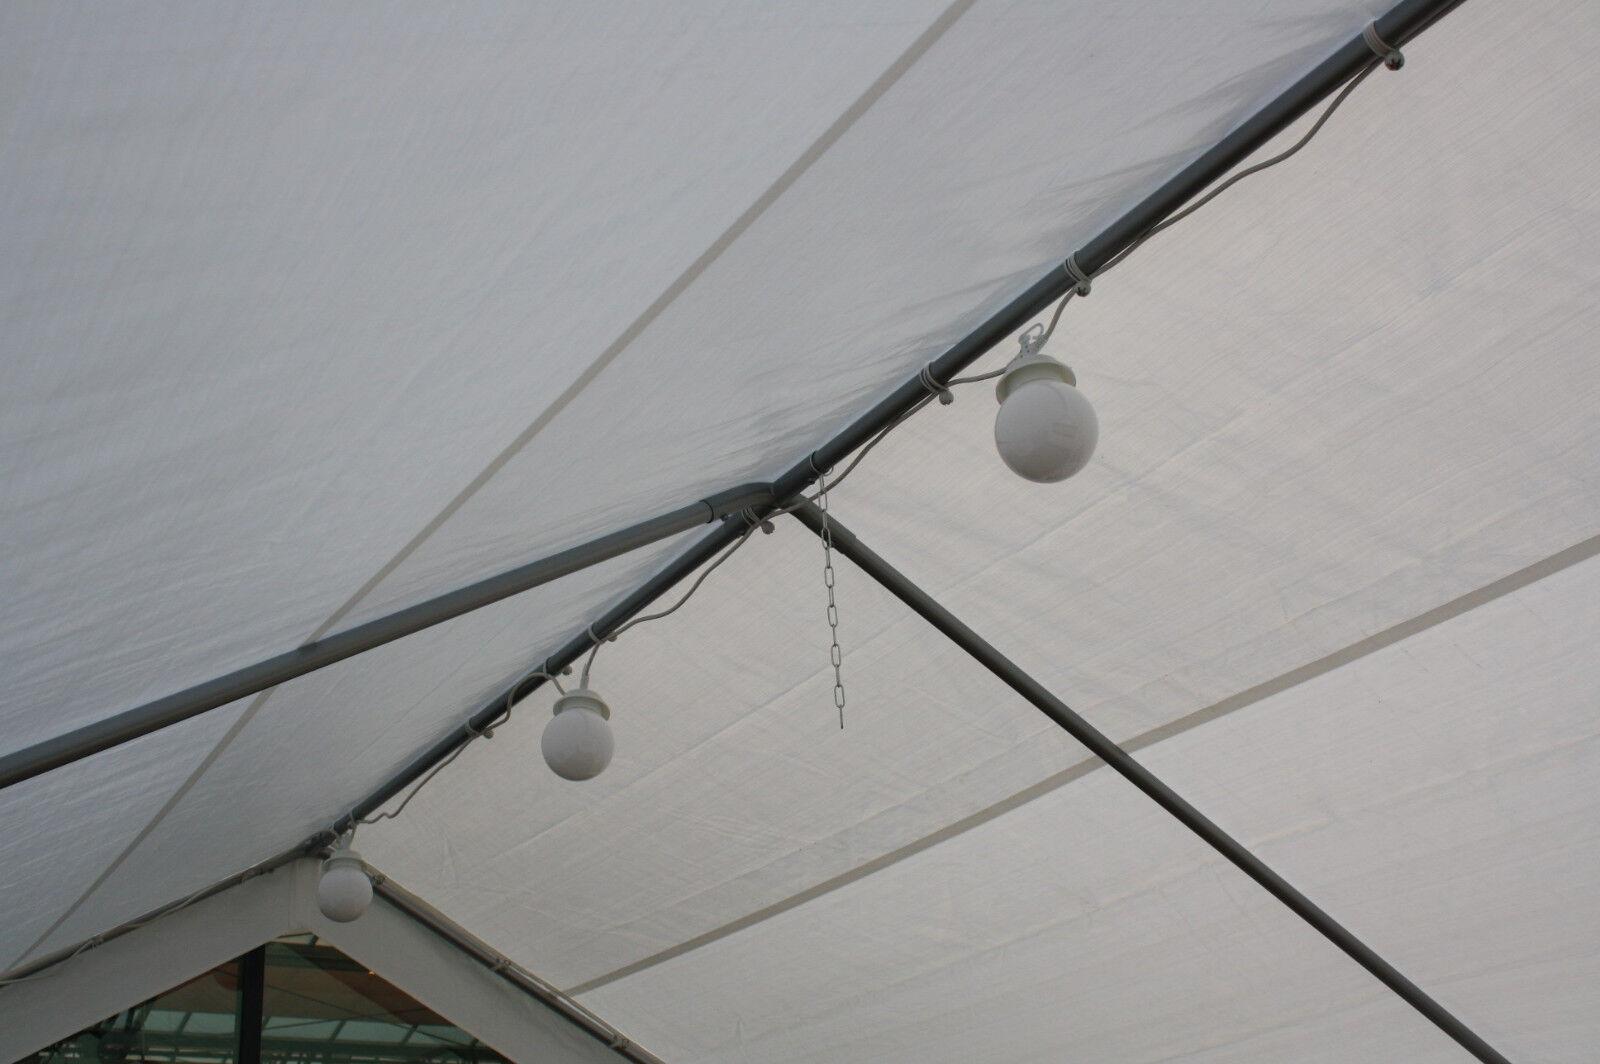 Verlichting Lichtbol 6stuks LED voor Partytent